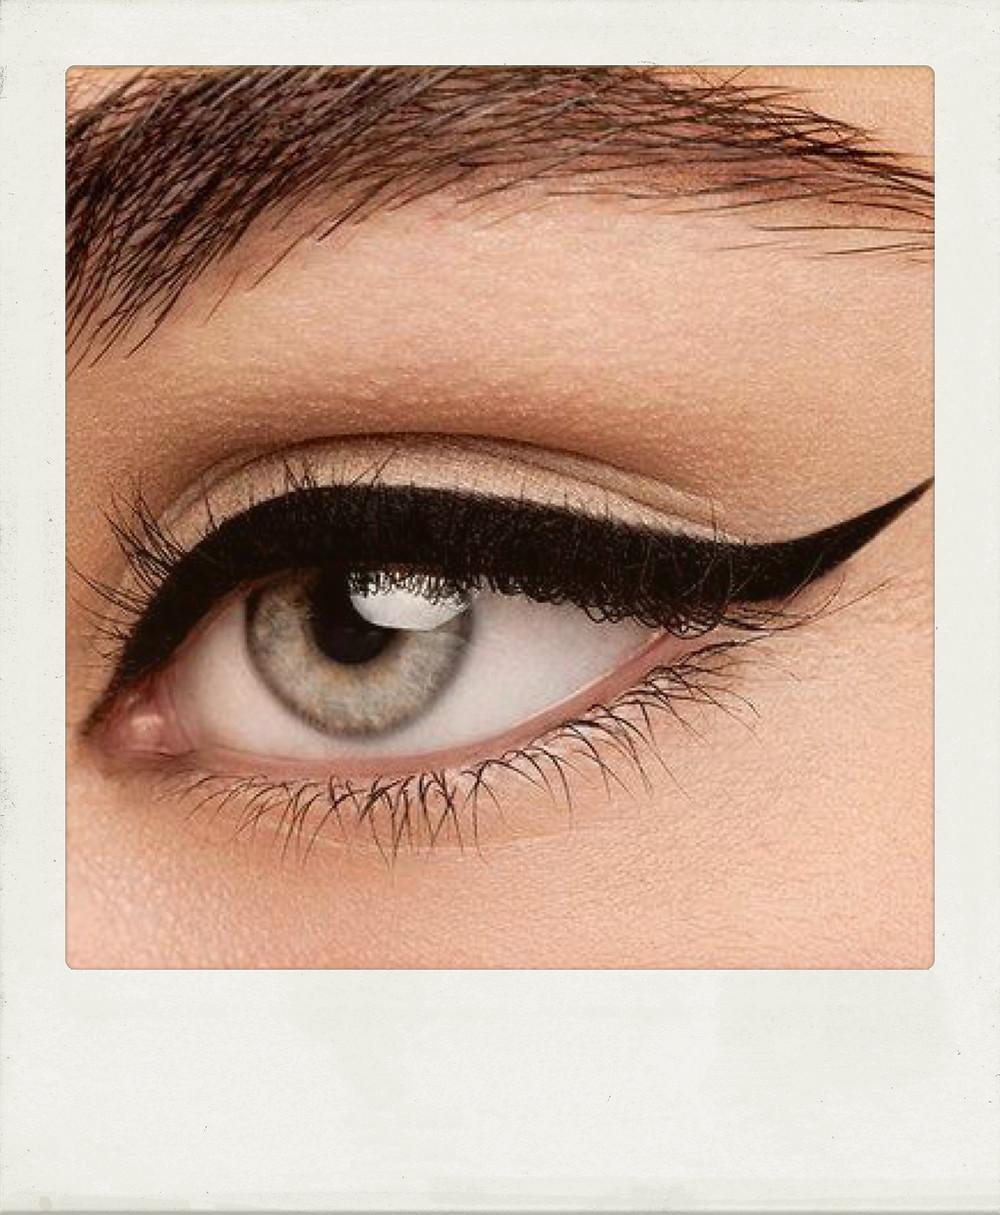 black eyebrows, dark brows, eyebrows, filling in brows